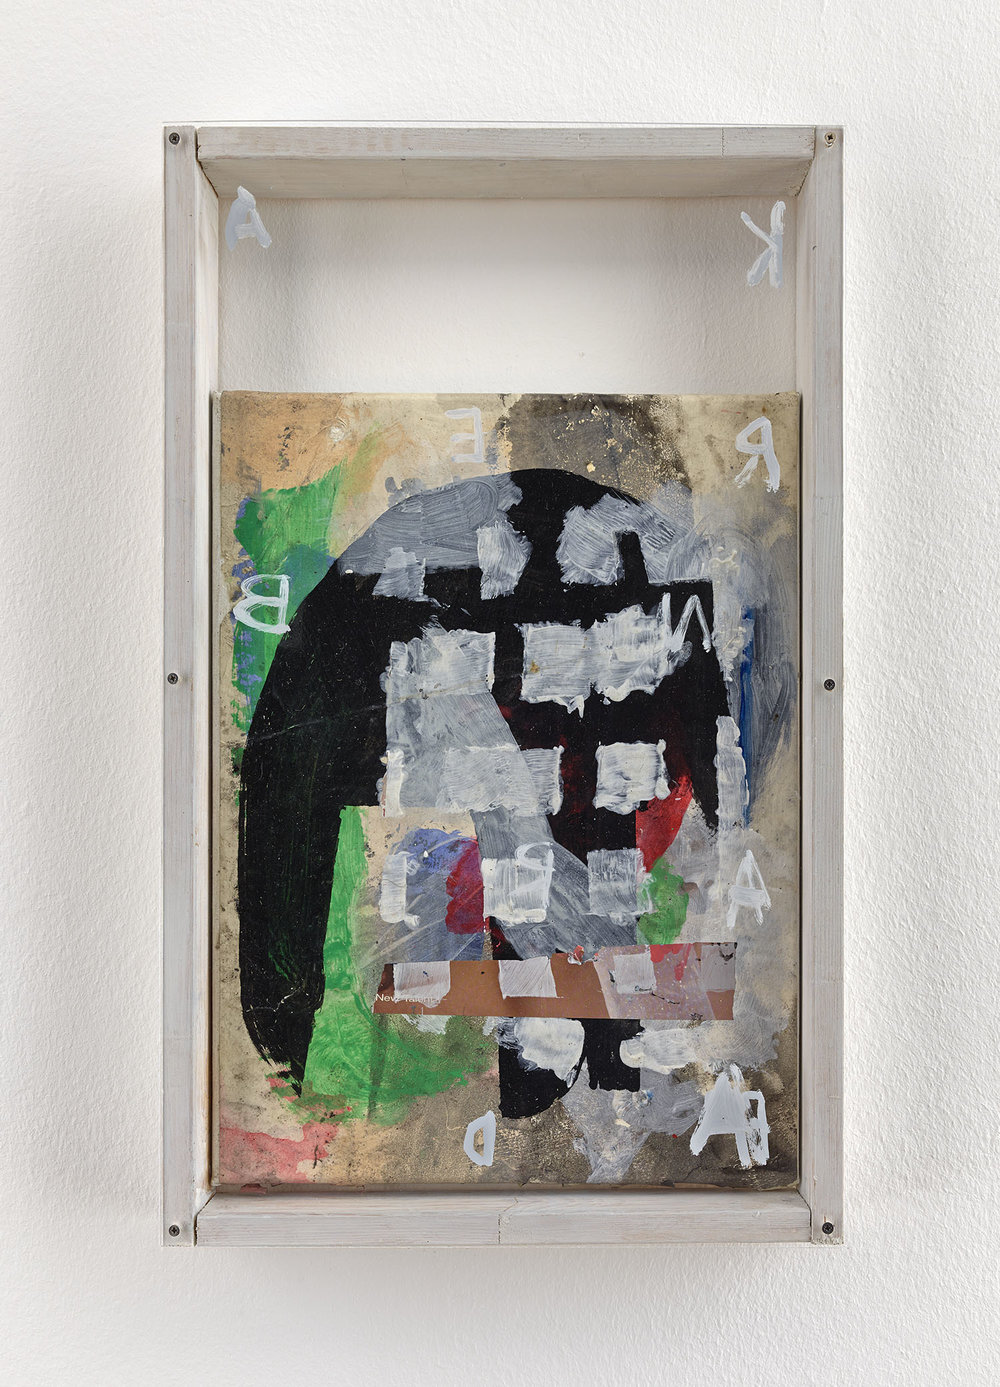 o.T. (Karen Barad) | 2015 |Papier auf Leinwand, Lack, Acryl, Holz, Plexiglas |46 x 33,5 cm